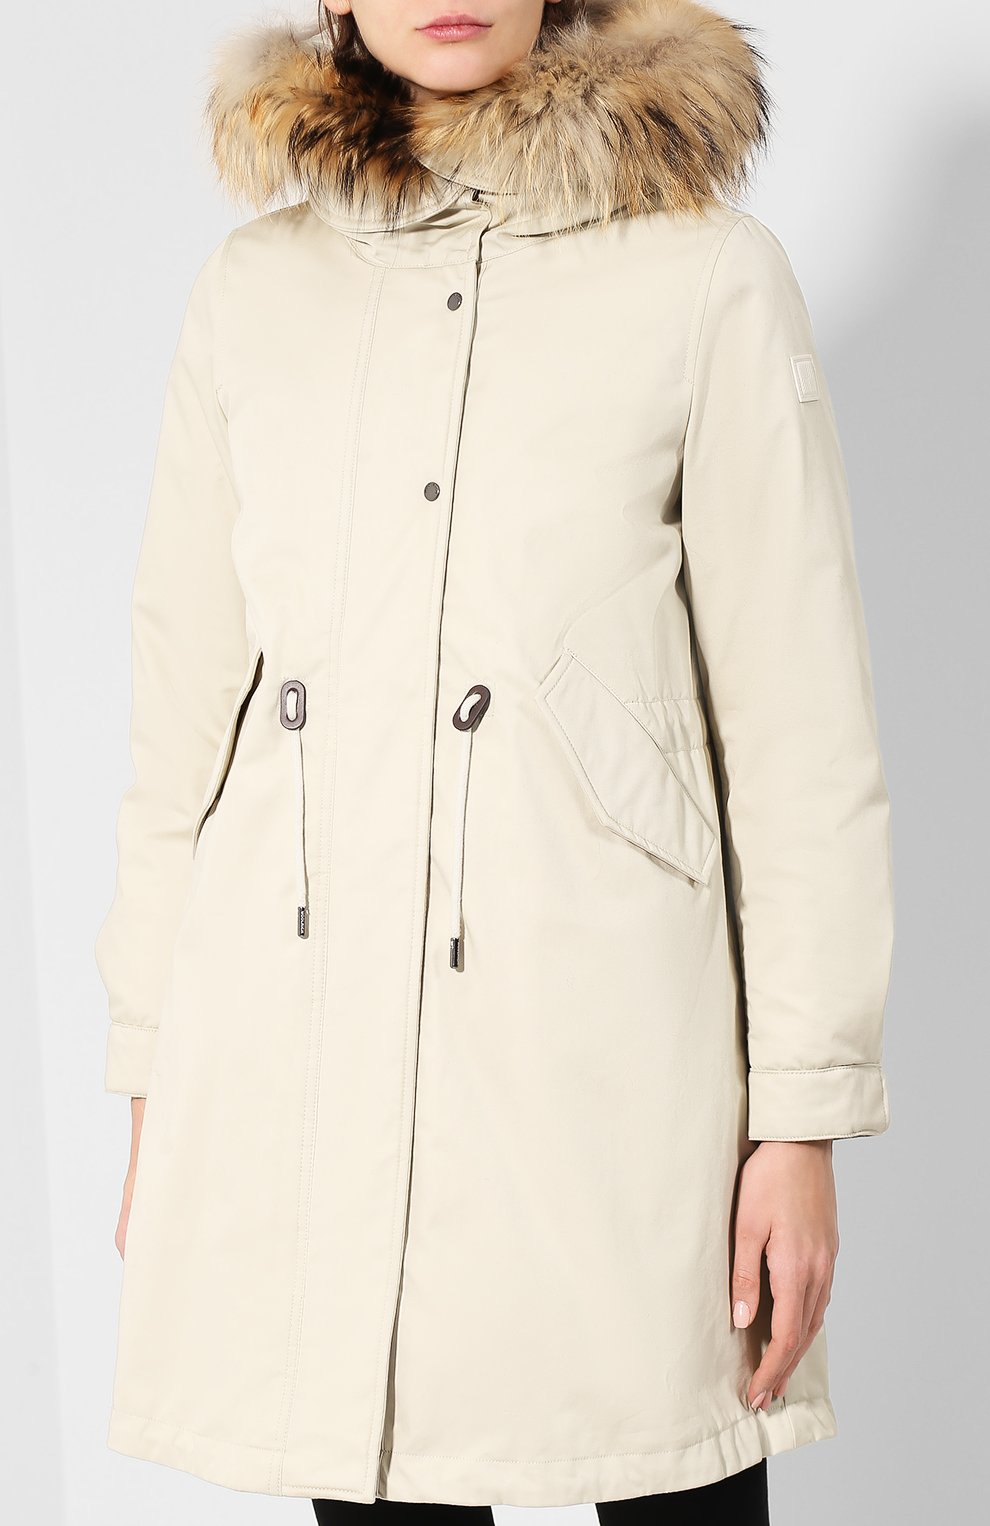 Комплект из двух курток | Фото №3